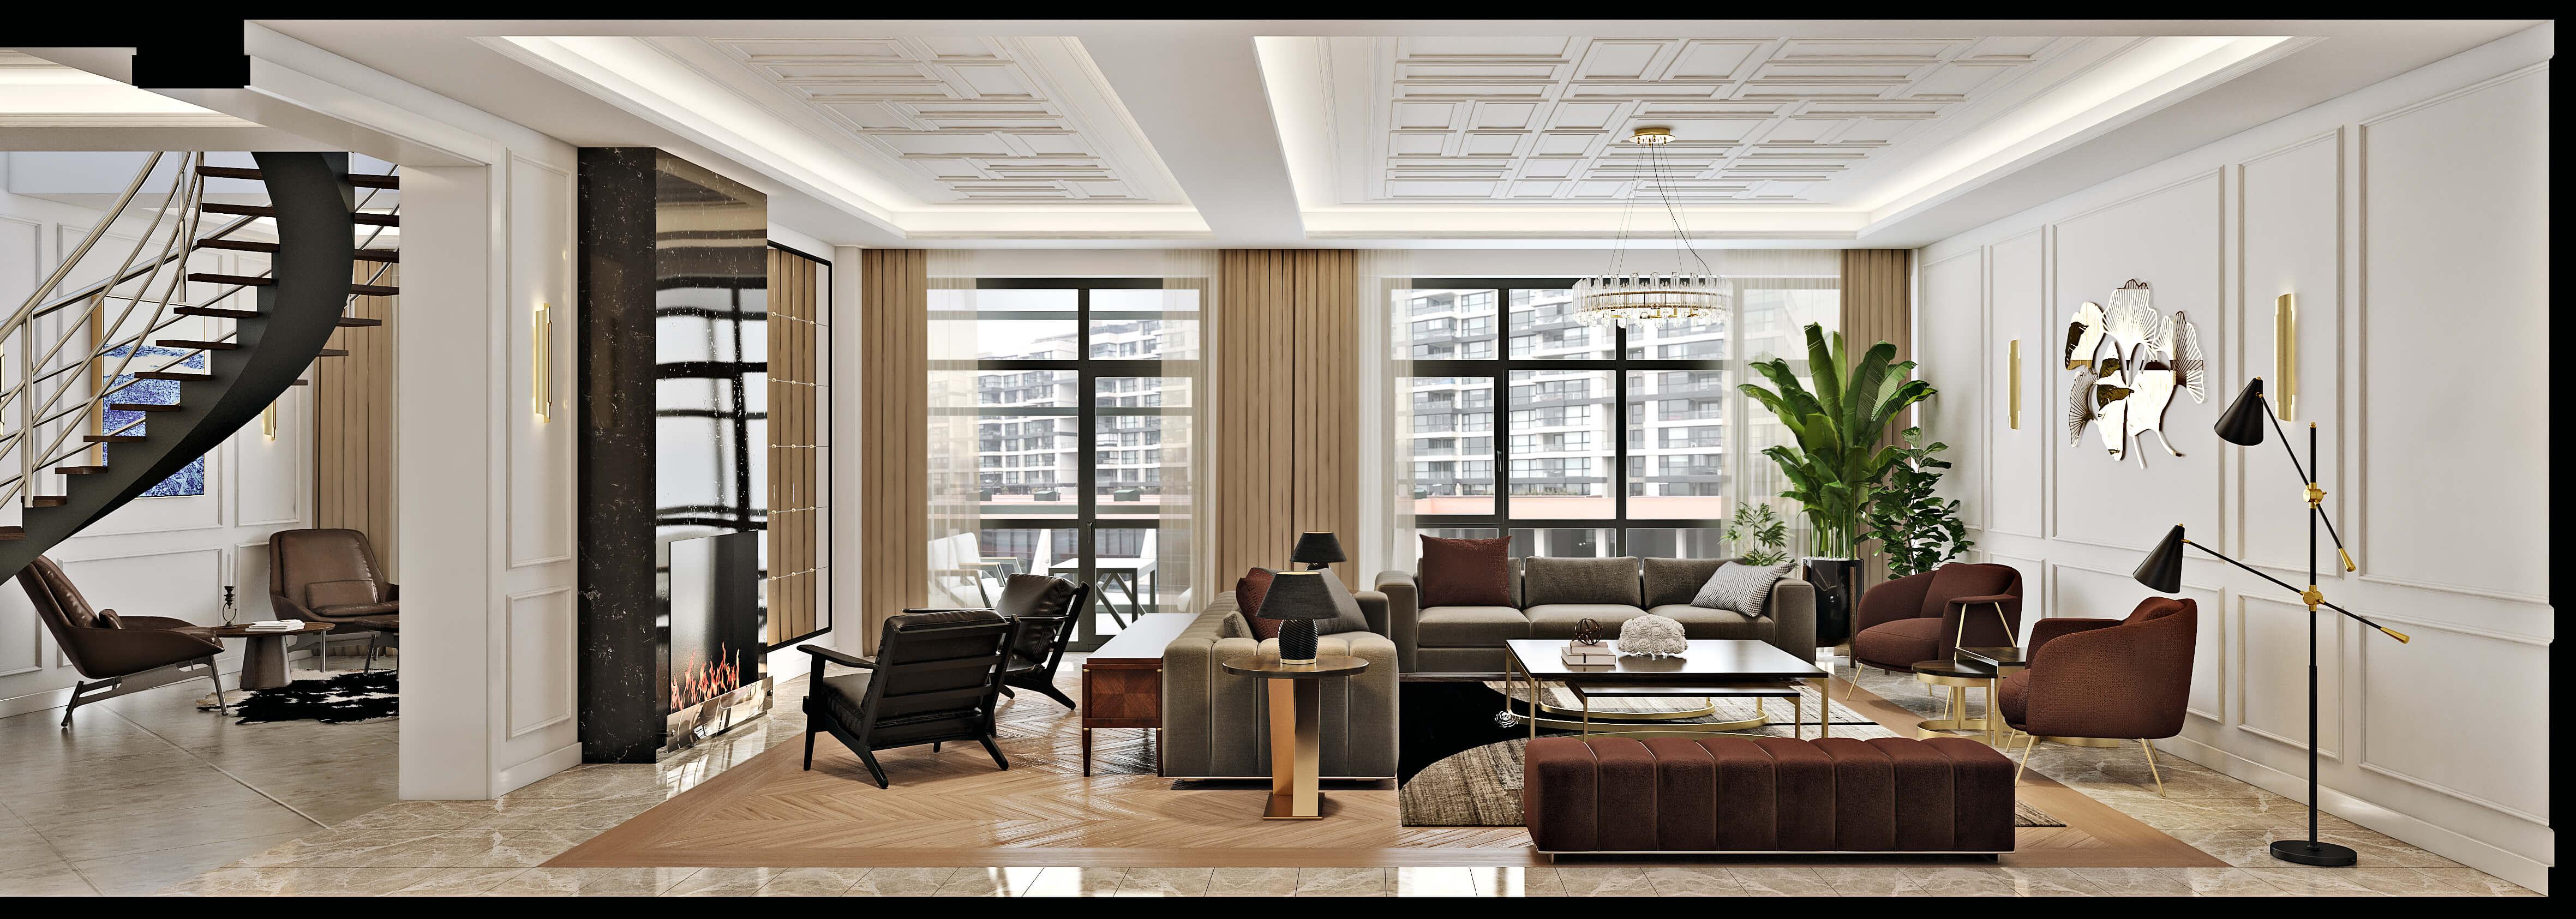 Incek Prestij 4483 Incek Prestij Dublex Apartment Residential